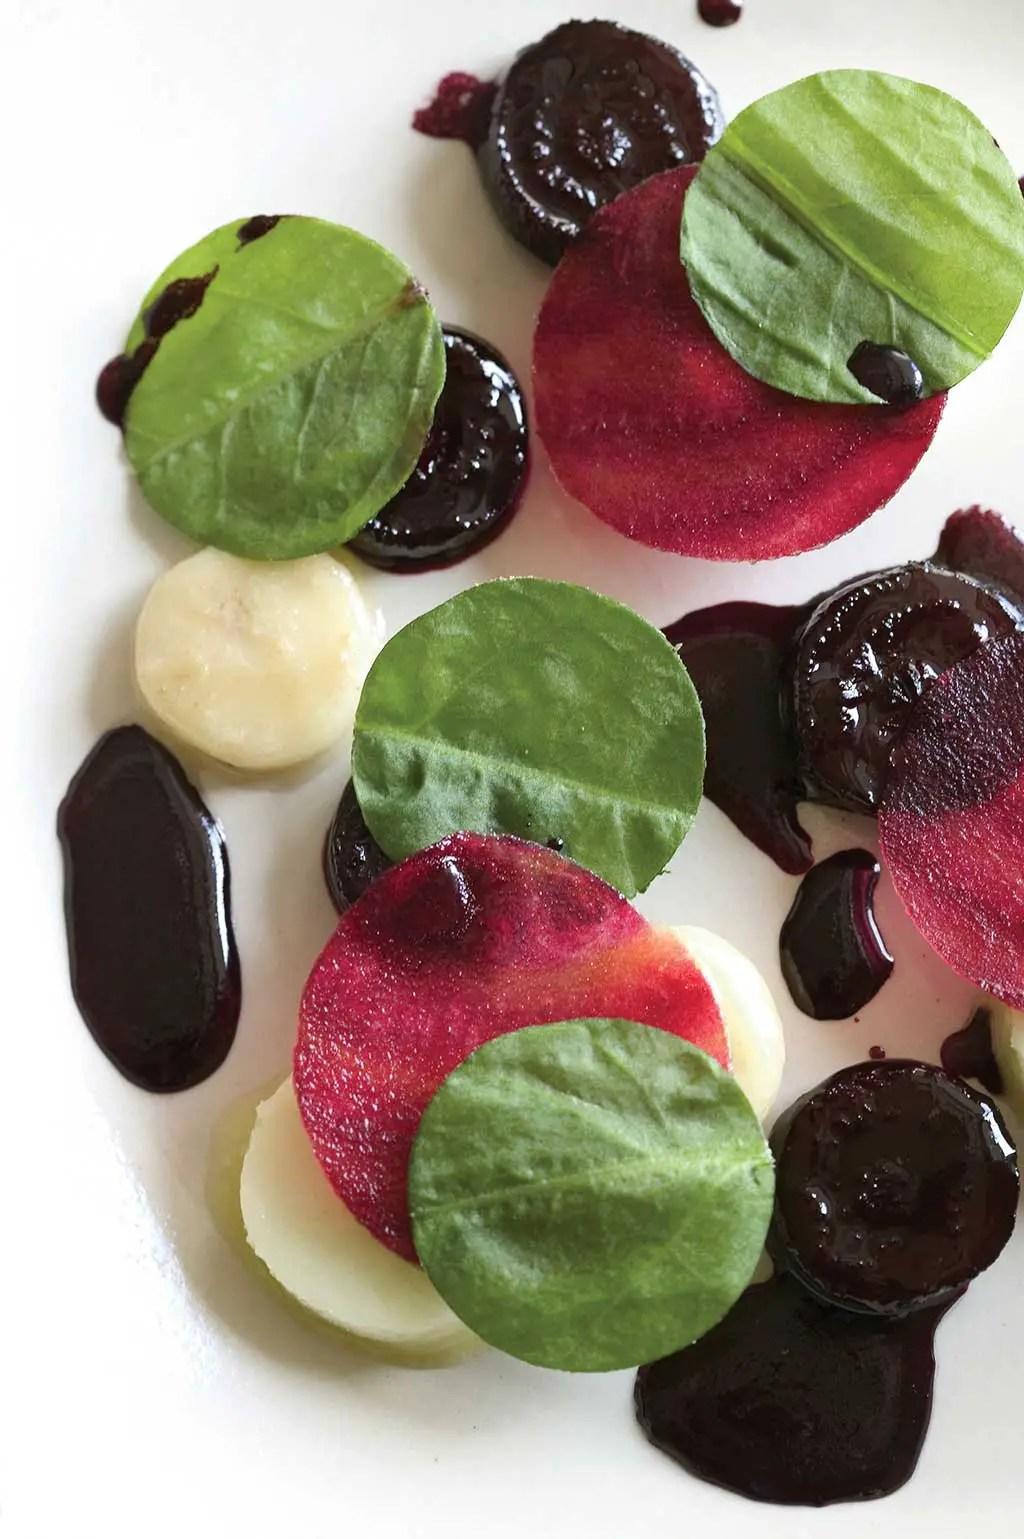 Glazed beets and apples at Restaurant noma, Copenhagen